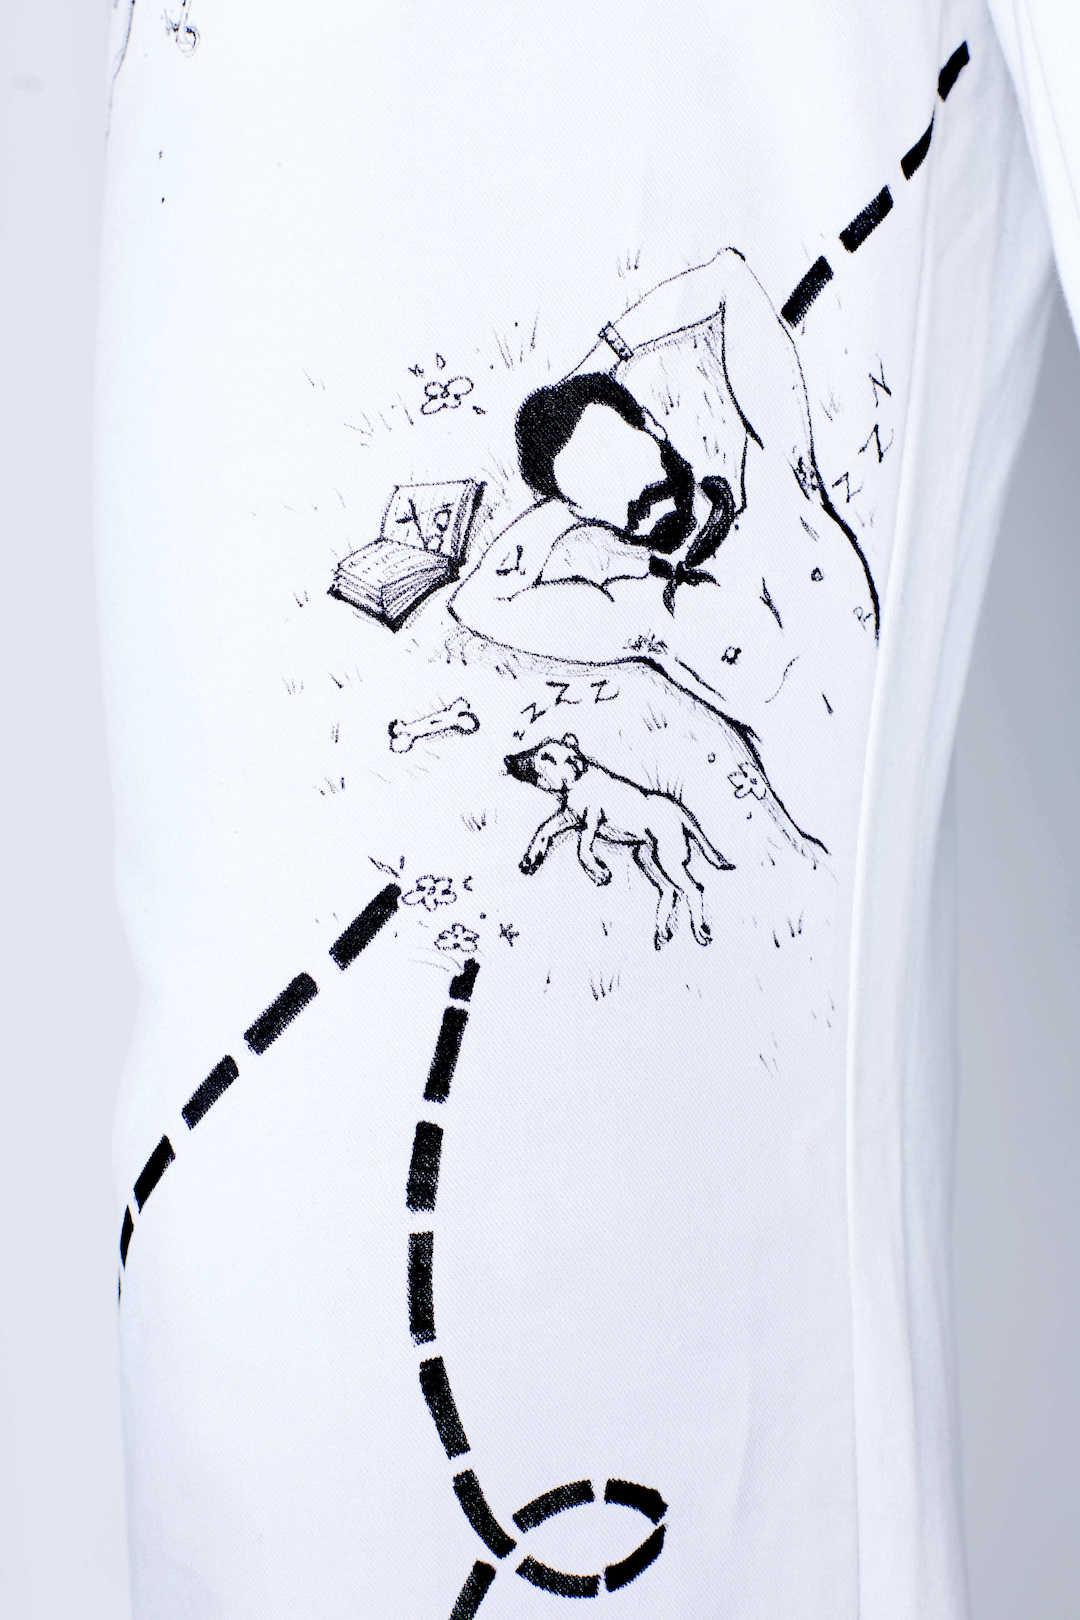 Detail view of Michael Portait Pant by Natasha Blodgett featuring Michael